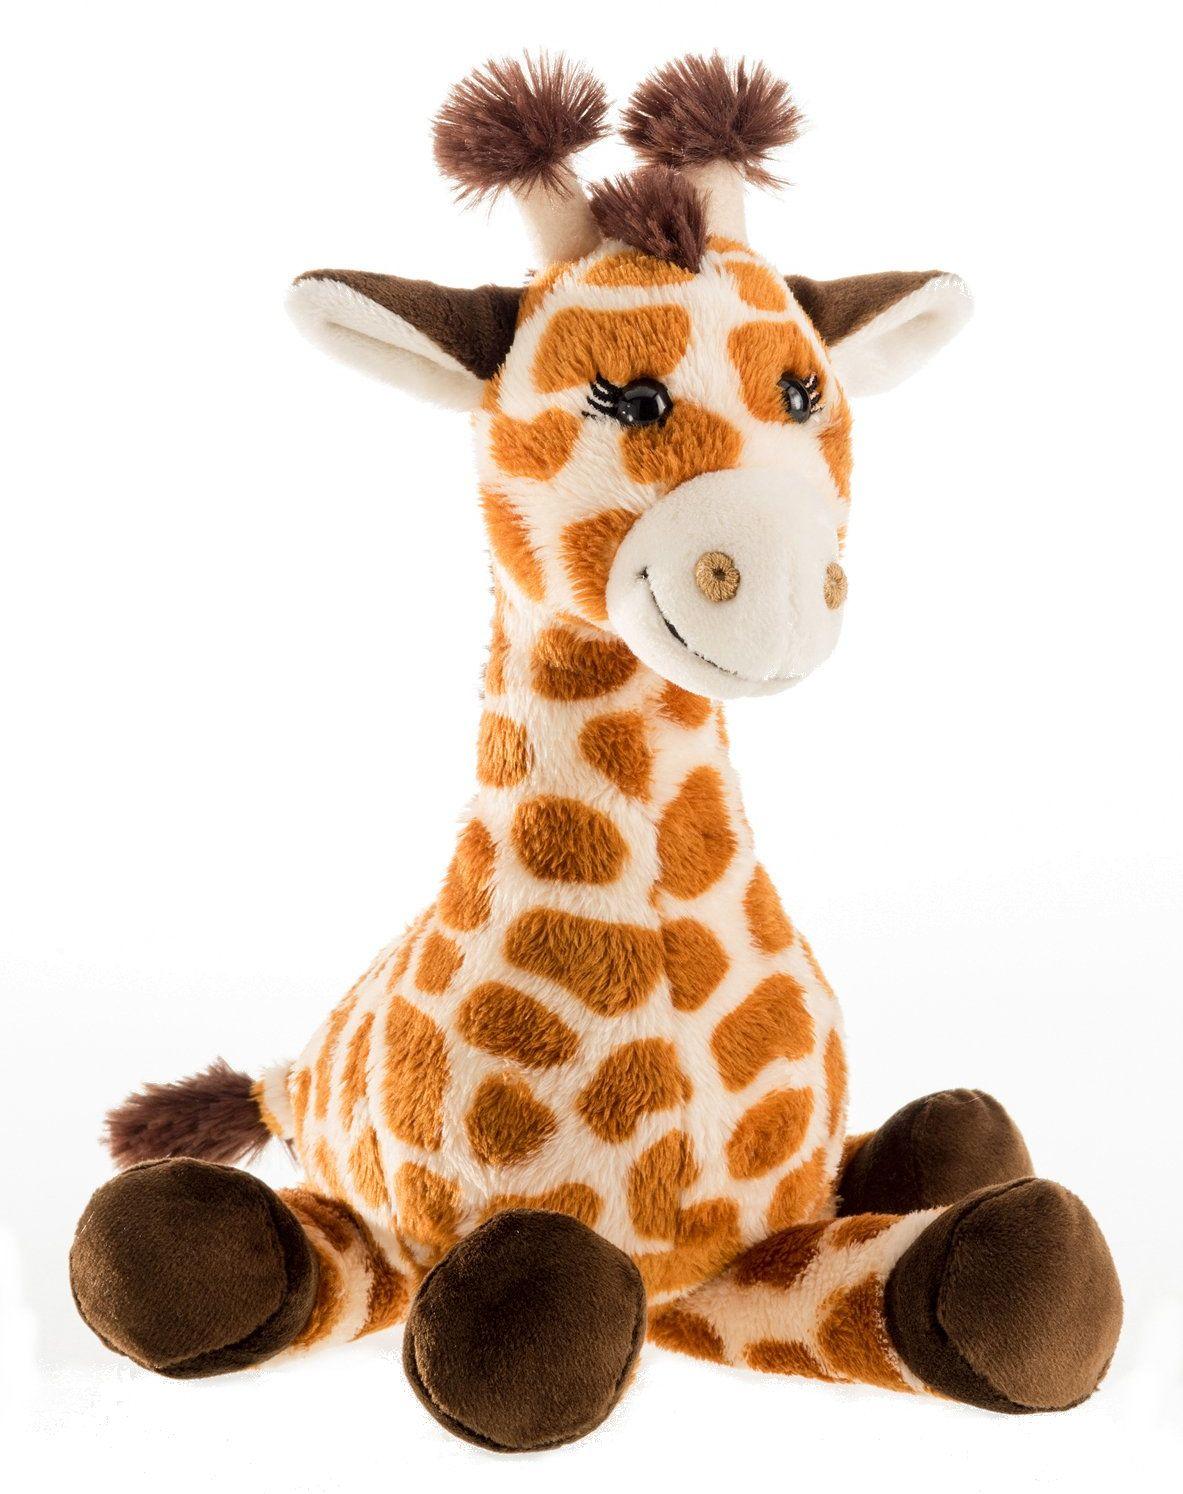 Schaffer 5563 pluszowa żyrafa Bahati, brązowa, L - 39 cm